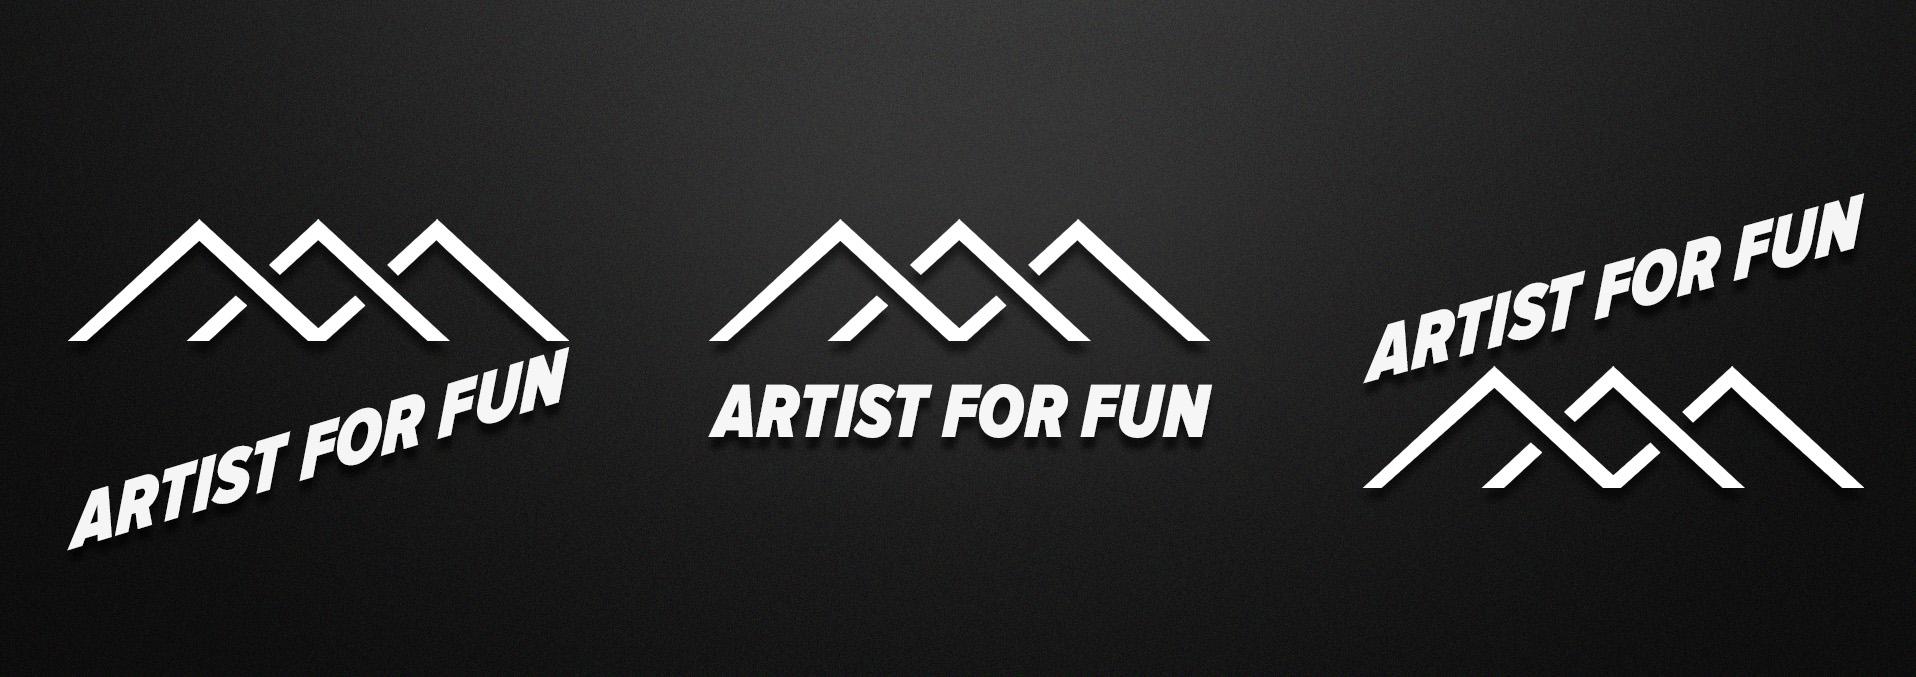 artist_fro_fiun_new_logo.jpg